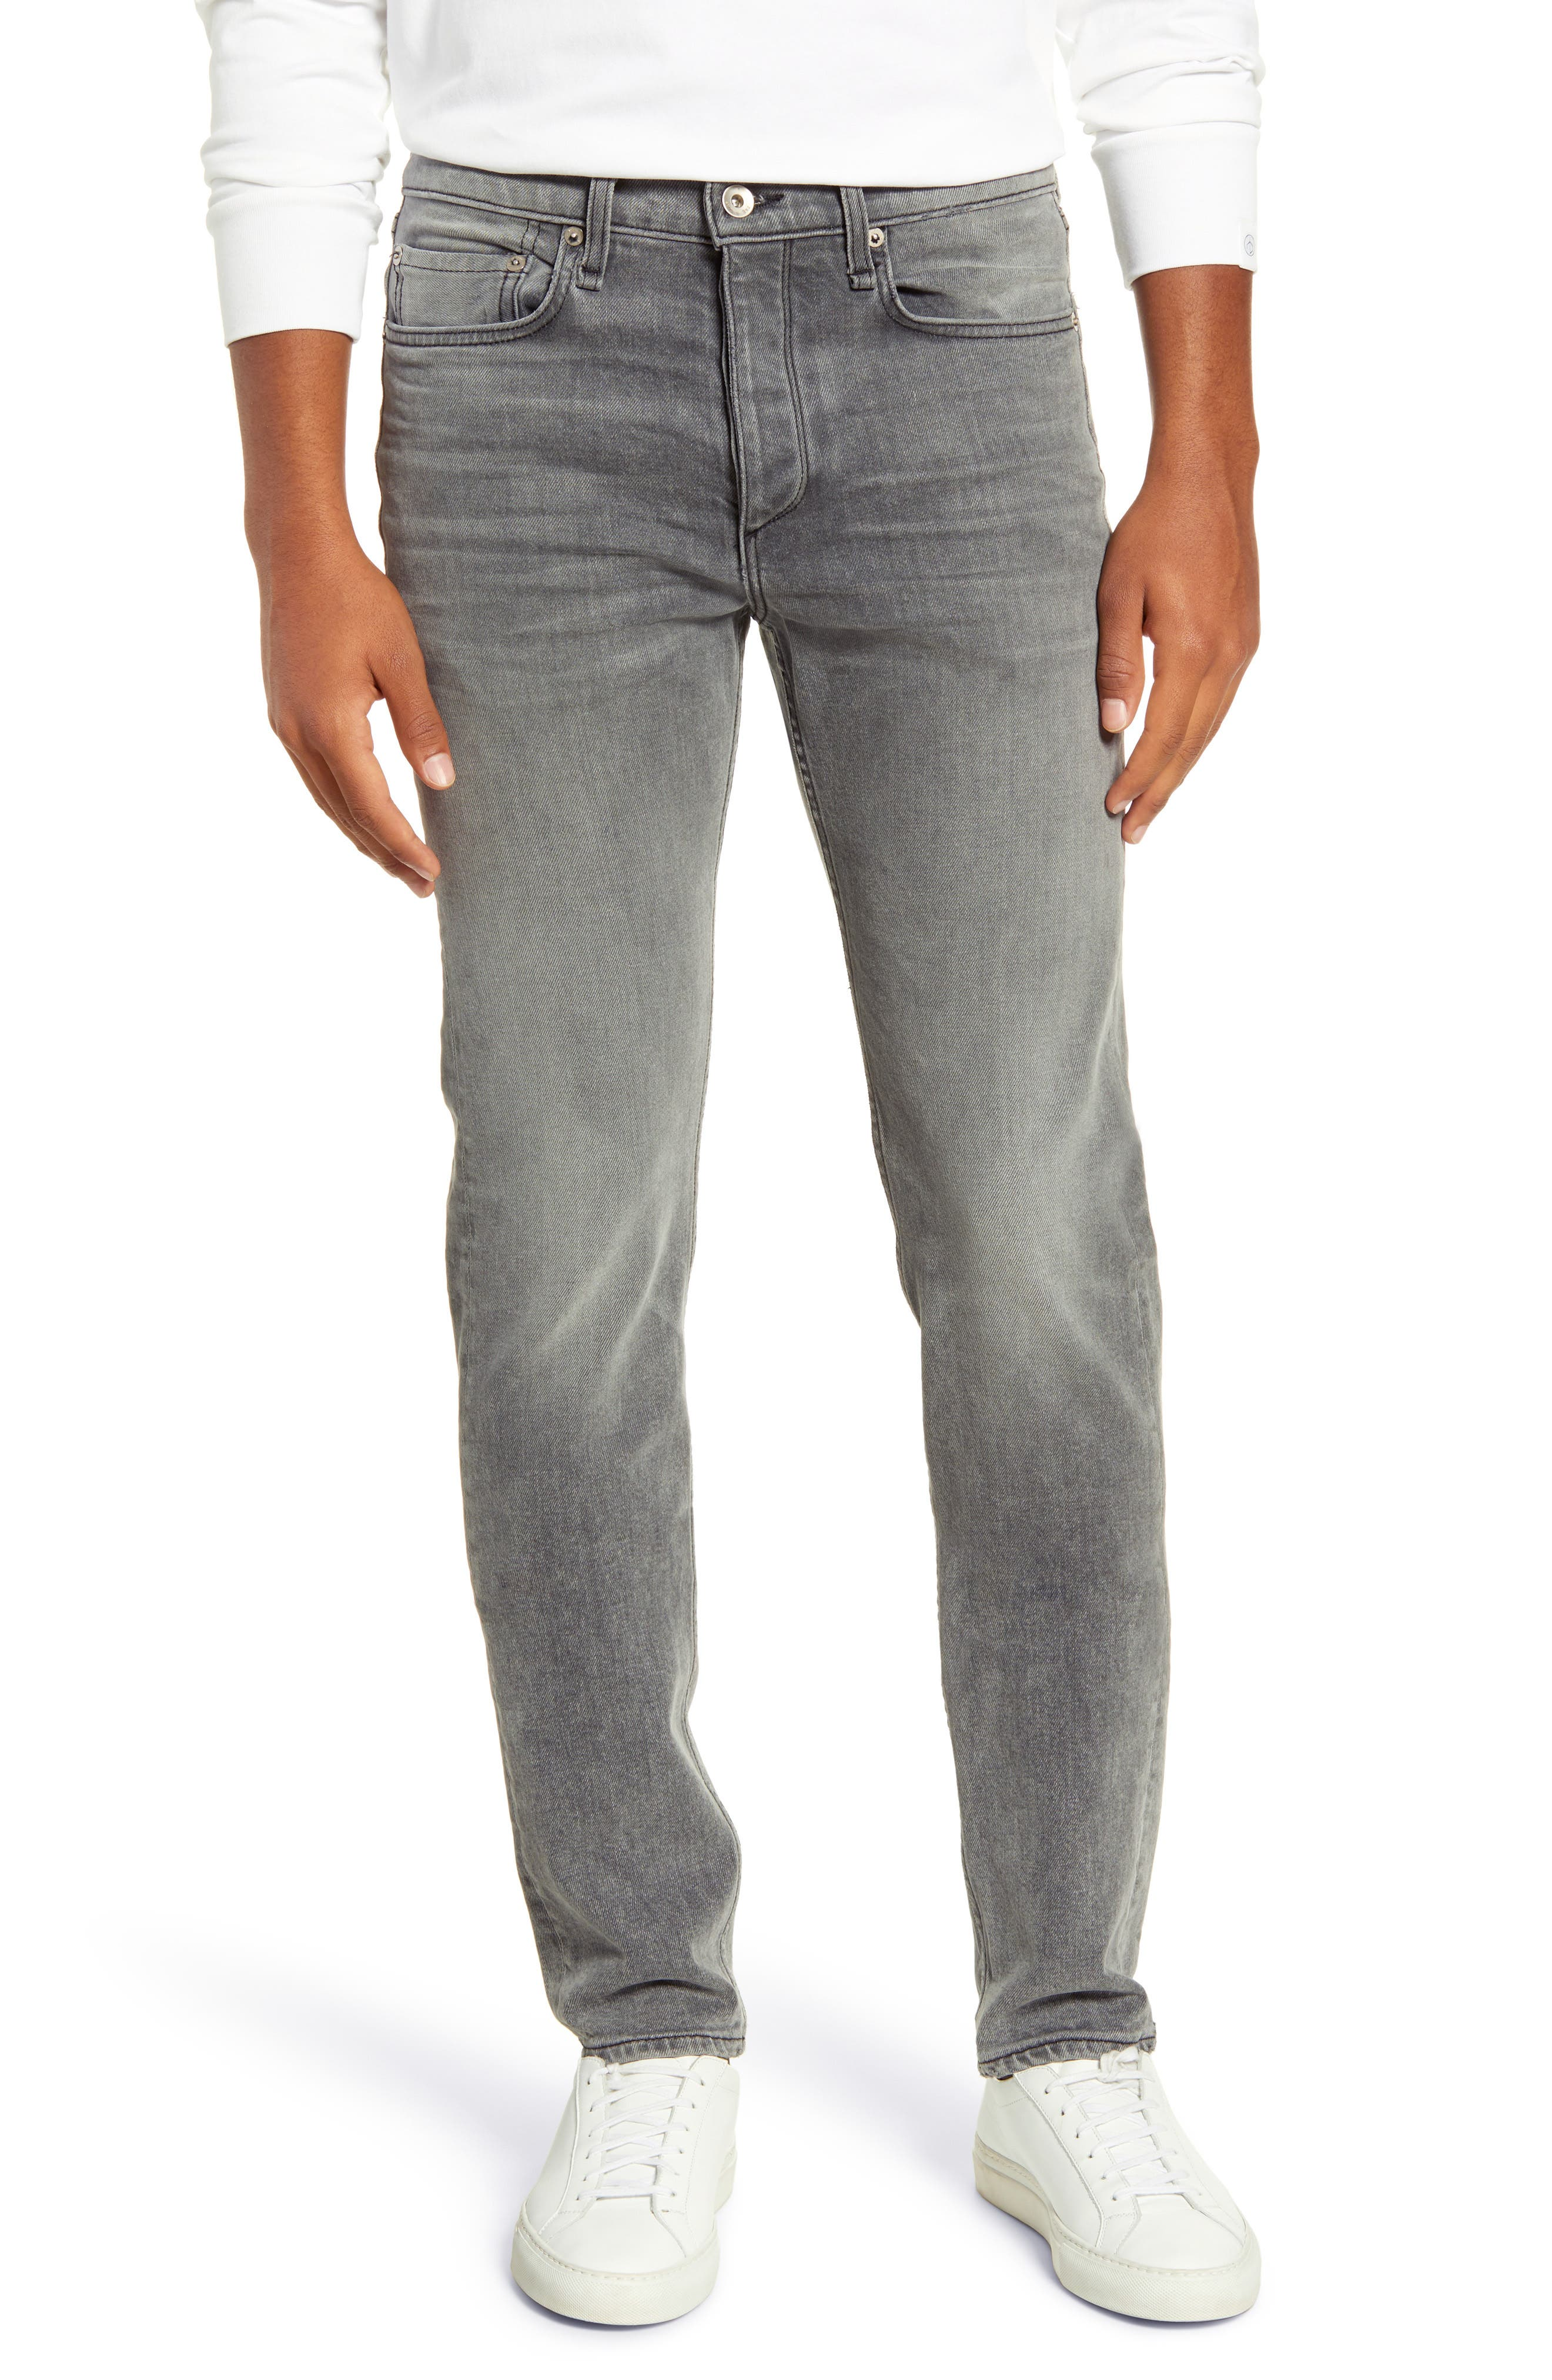 Men's Rag & Bone Fit 2 Slim Fit Jeans